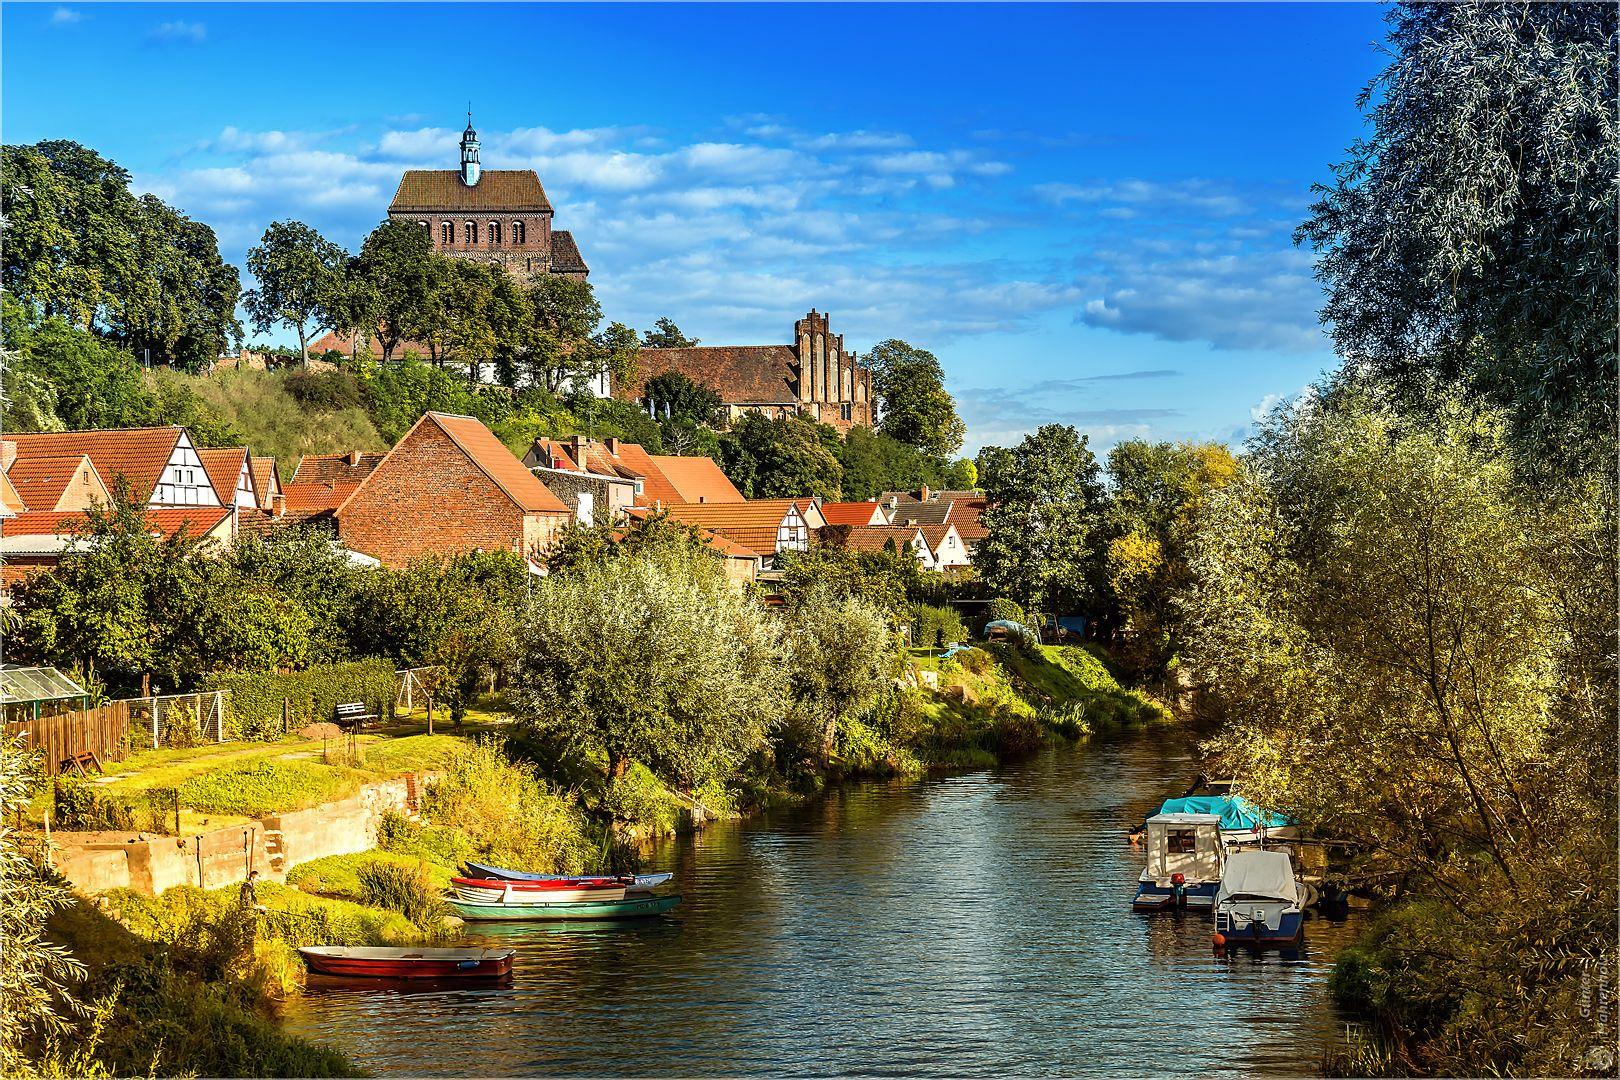 Havelberg, Domblick | Die schönsten orte deutschlands